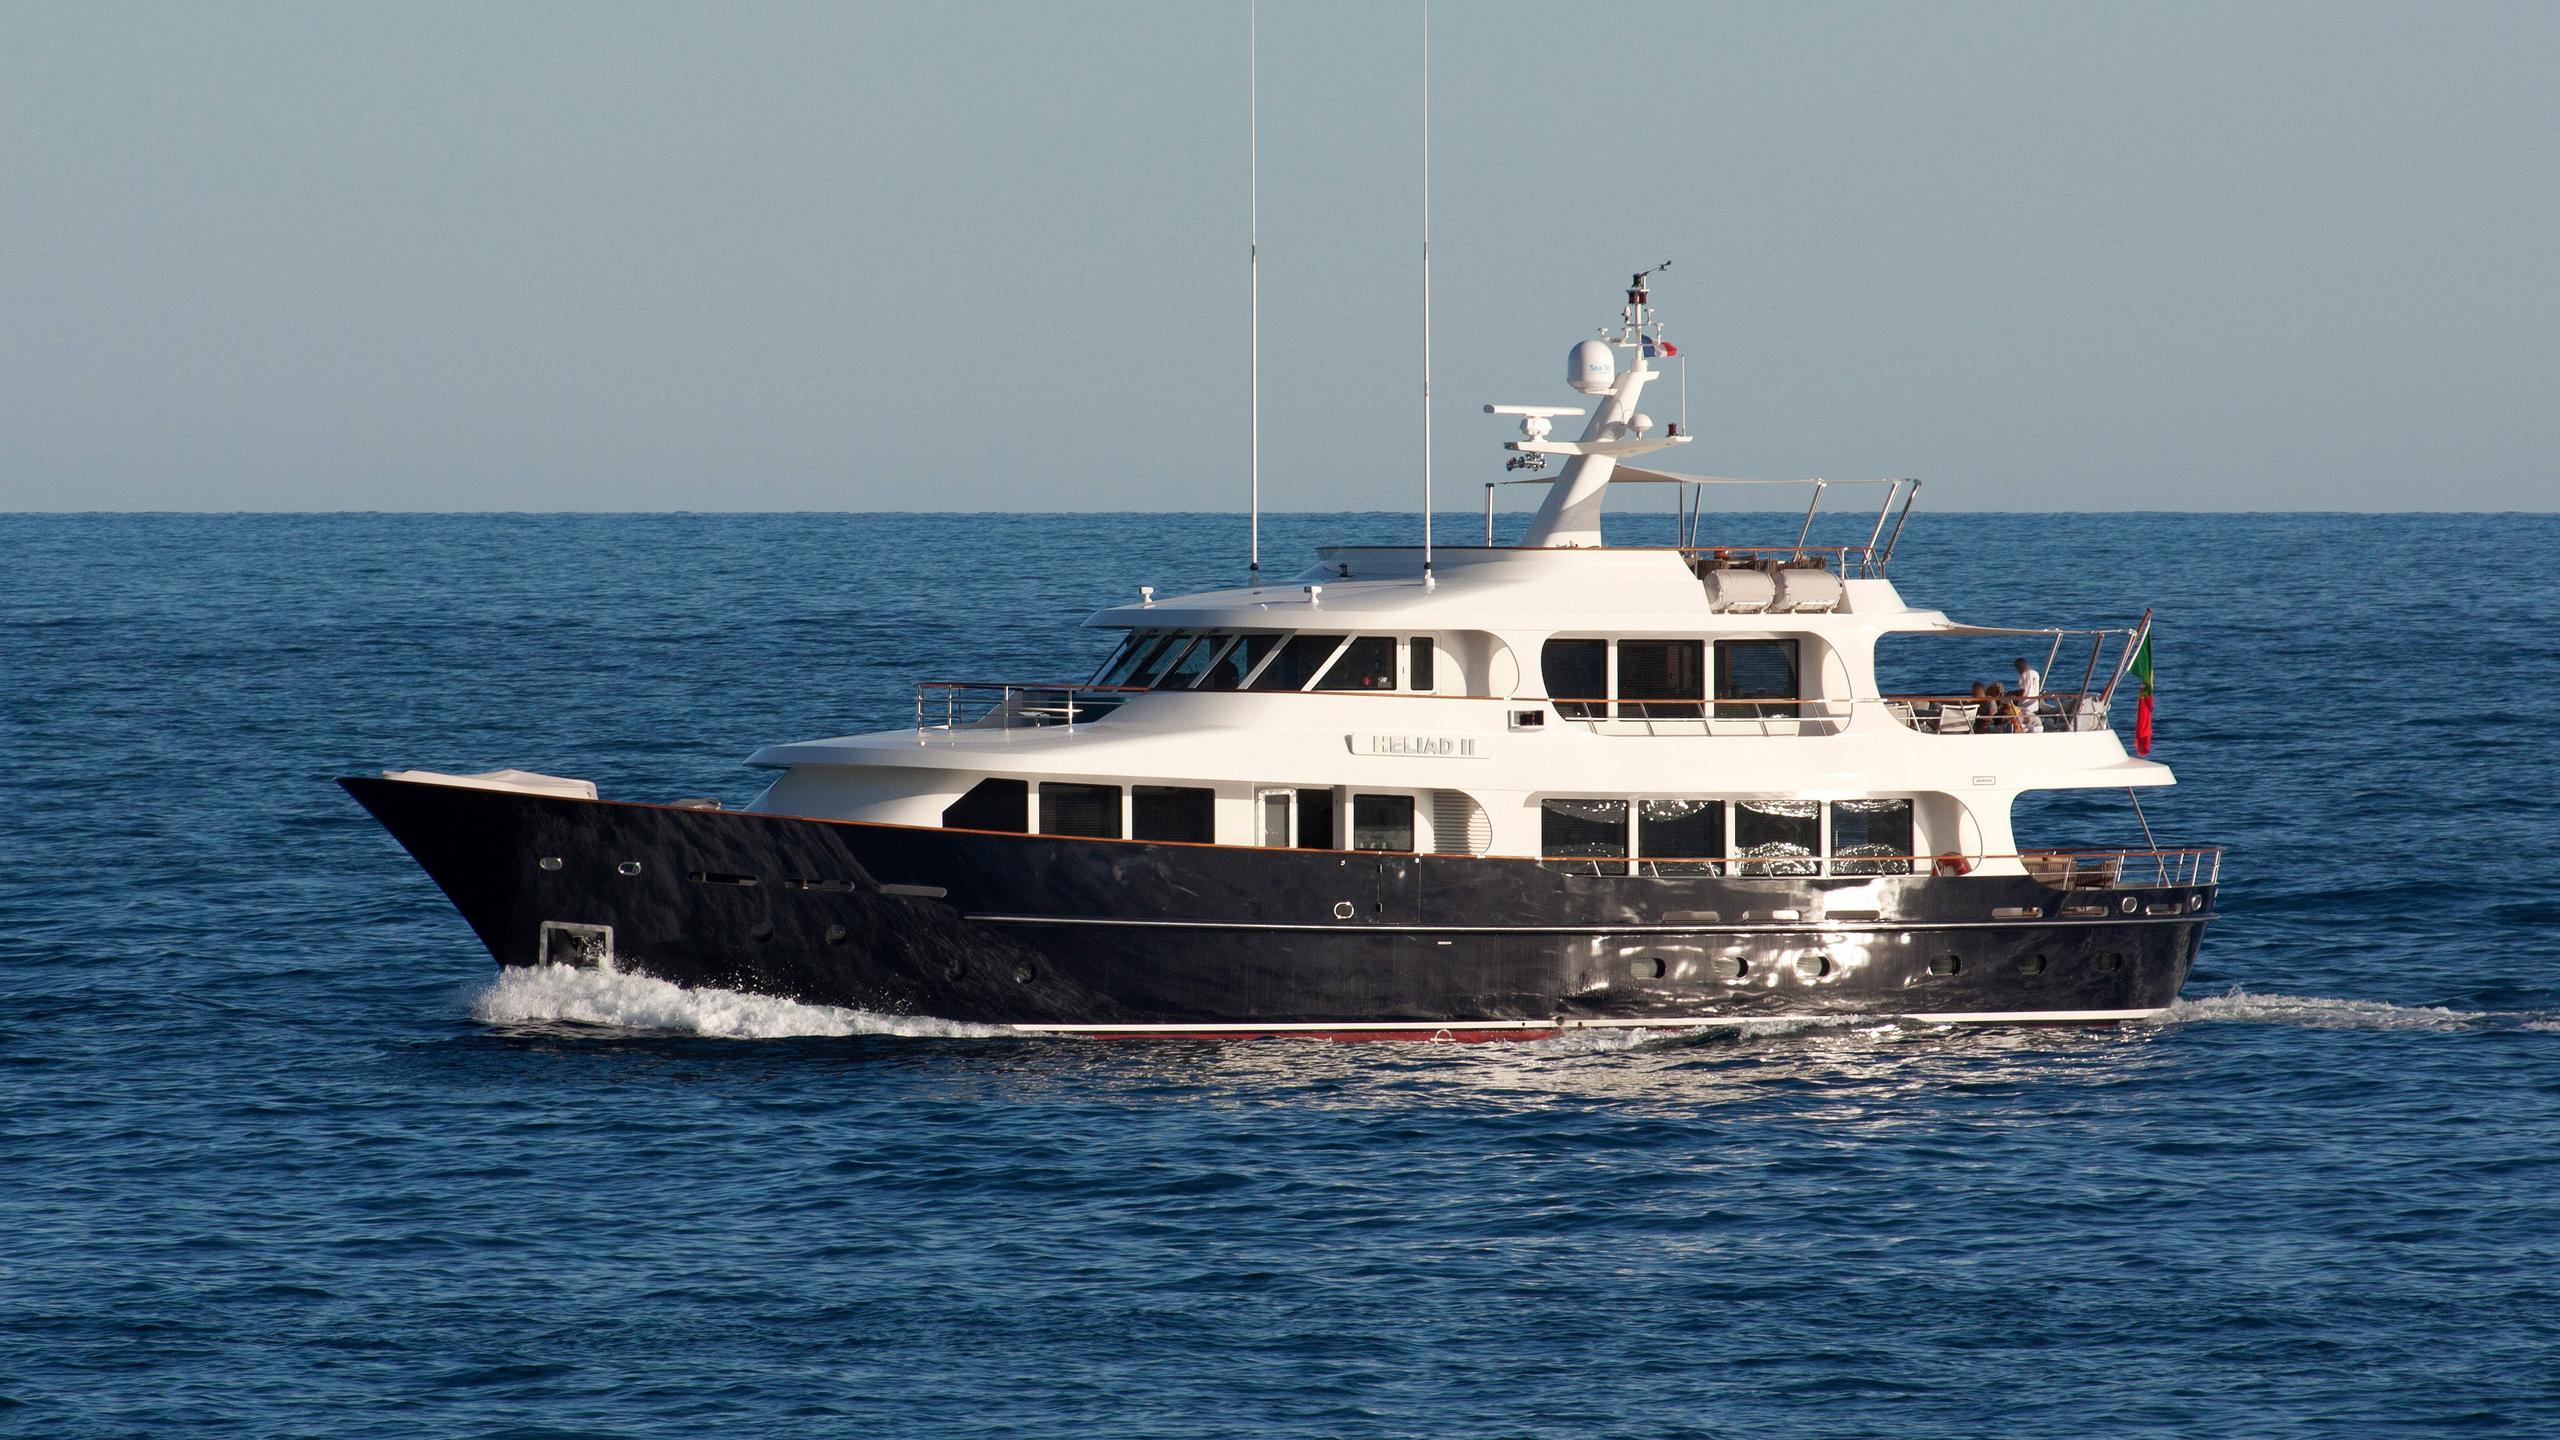 robbie-bobby-heliad-ii-motor-yacht-lynx-2013-33m-profile